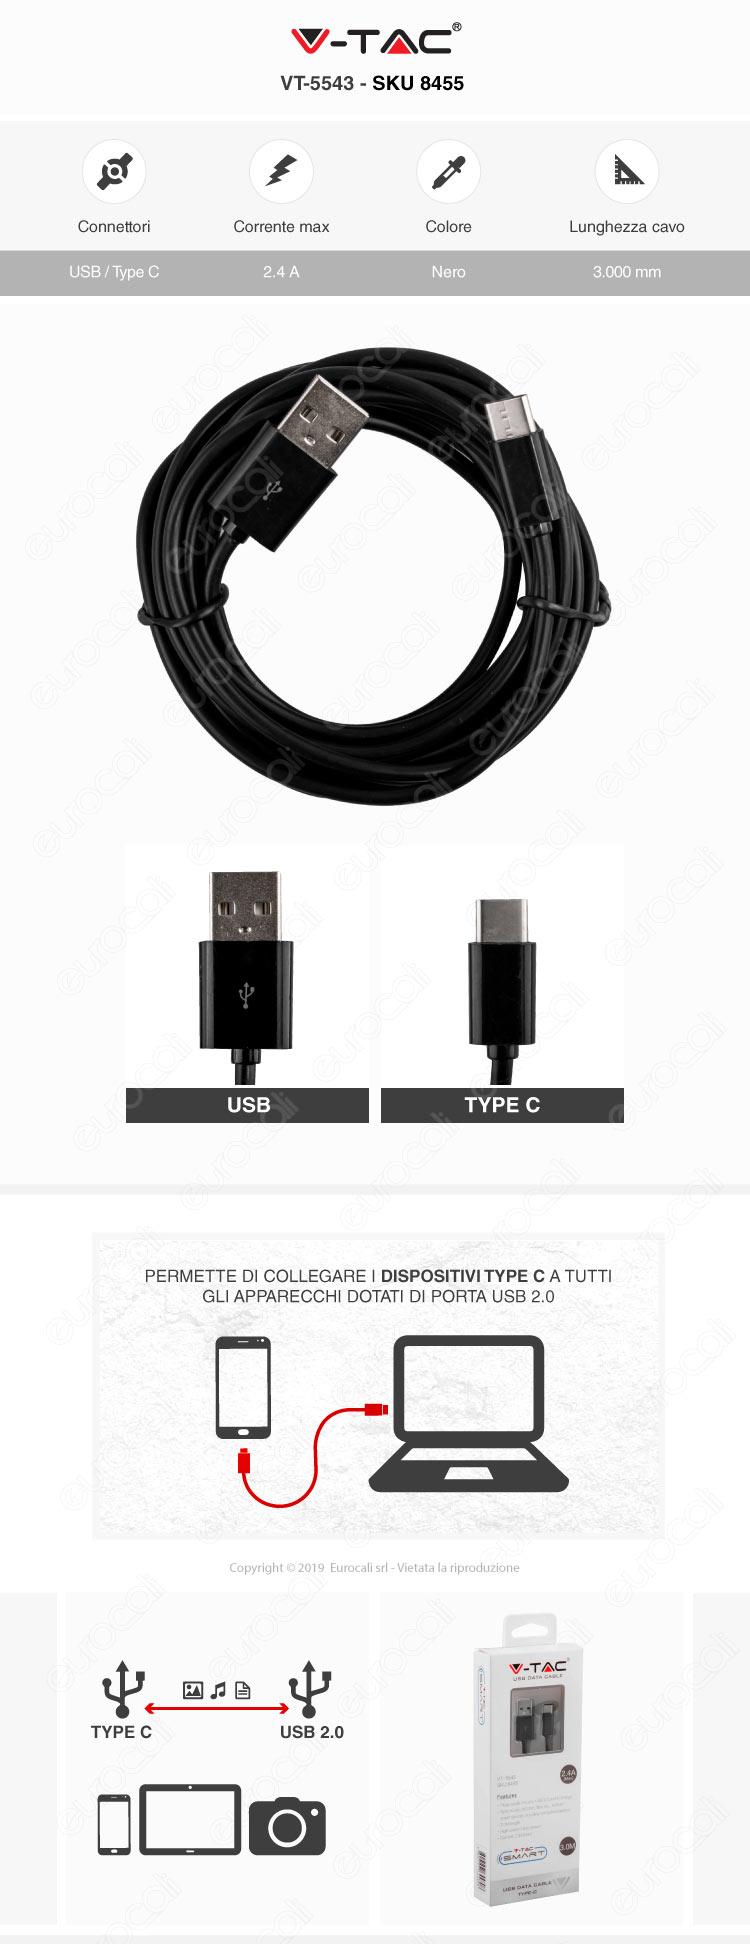 V-Tac VT-5543 USB Data Cable Type-C Cavo Colore Nero 3m